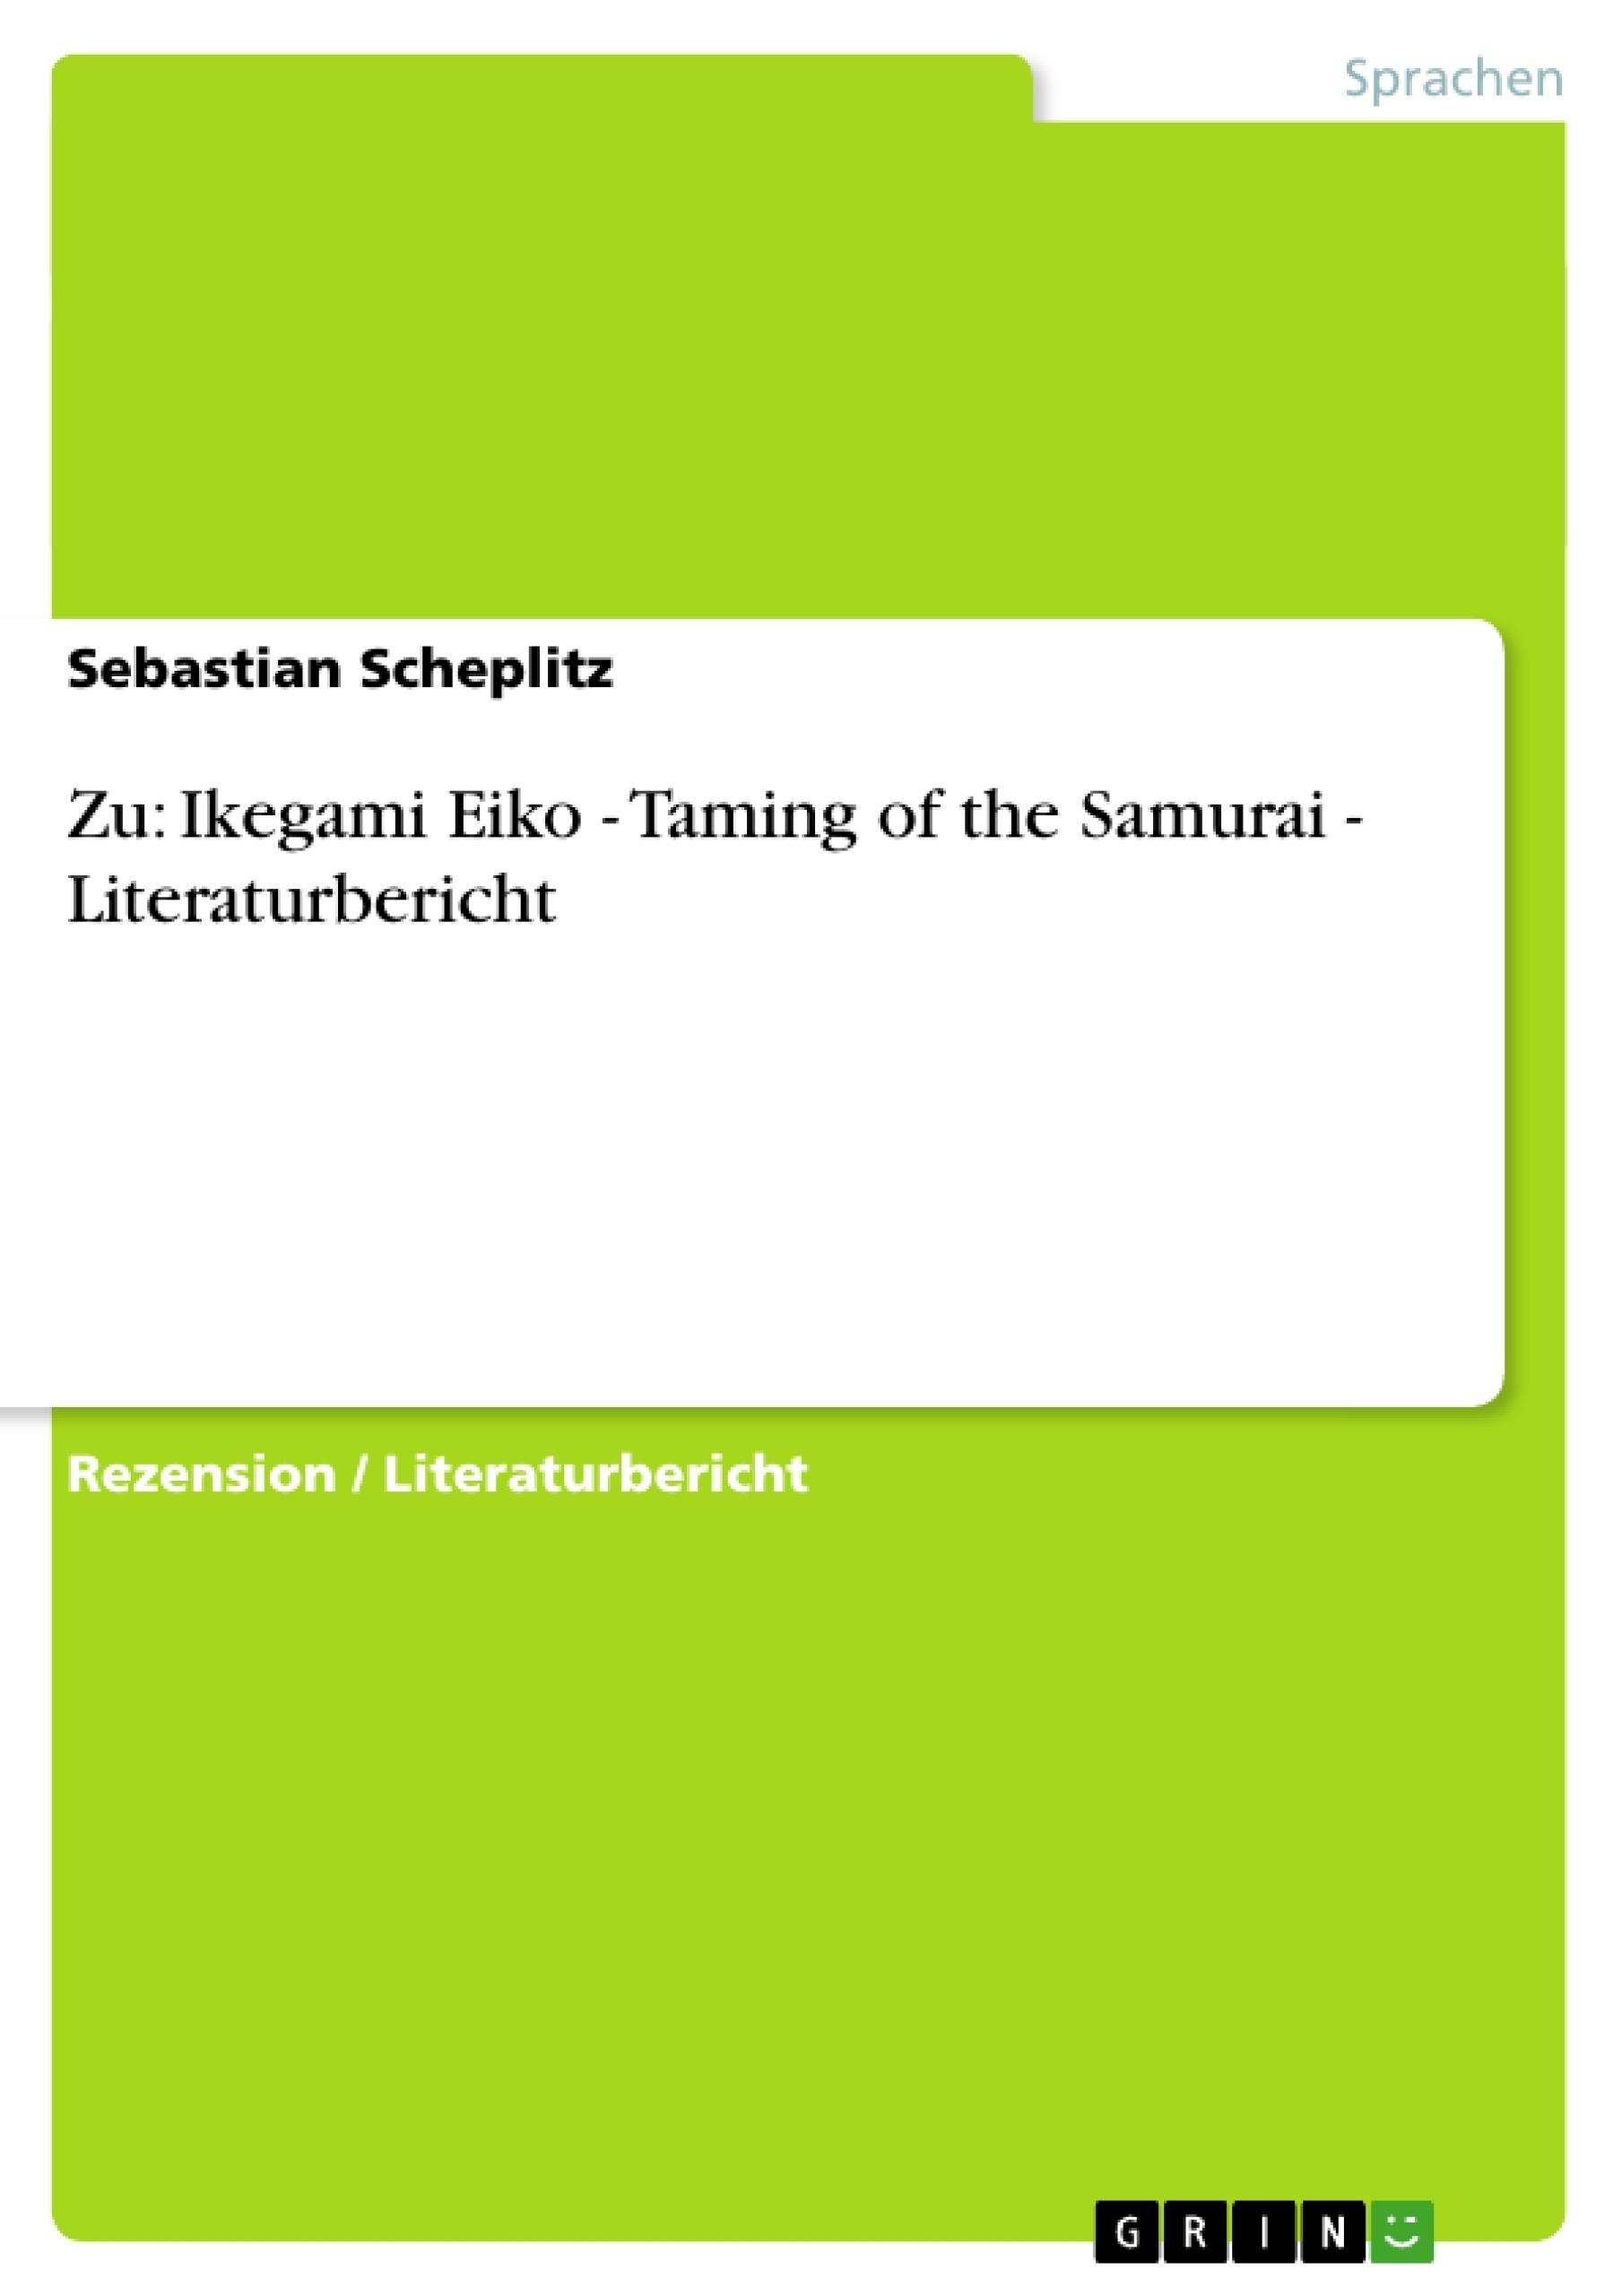 Titel: Zu: Ikegami Eiko - Taming of the Samurai - Literaturbericht